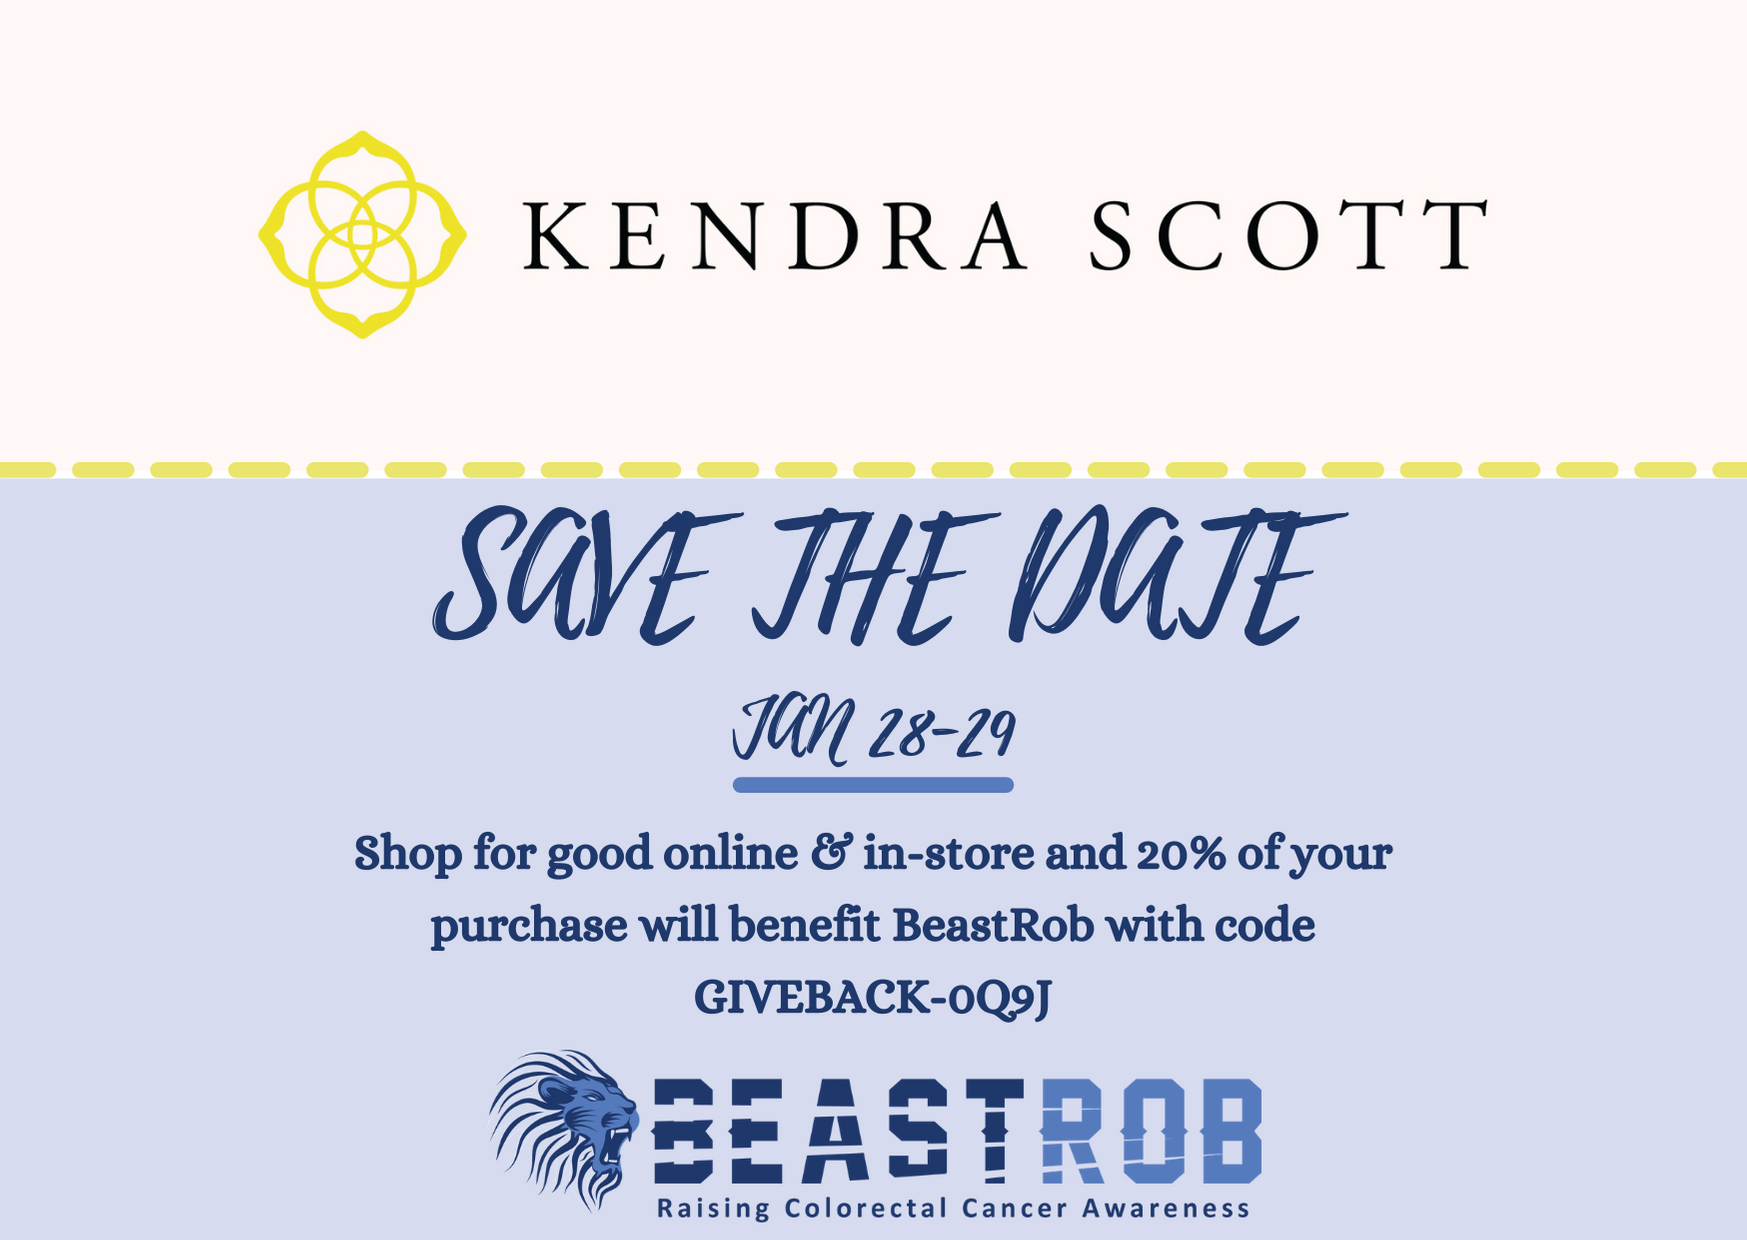 Kendra Scott – Shop for Good Online & In-Store